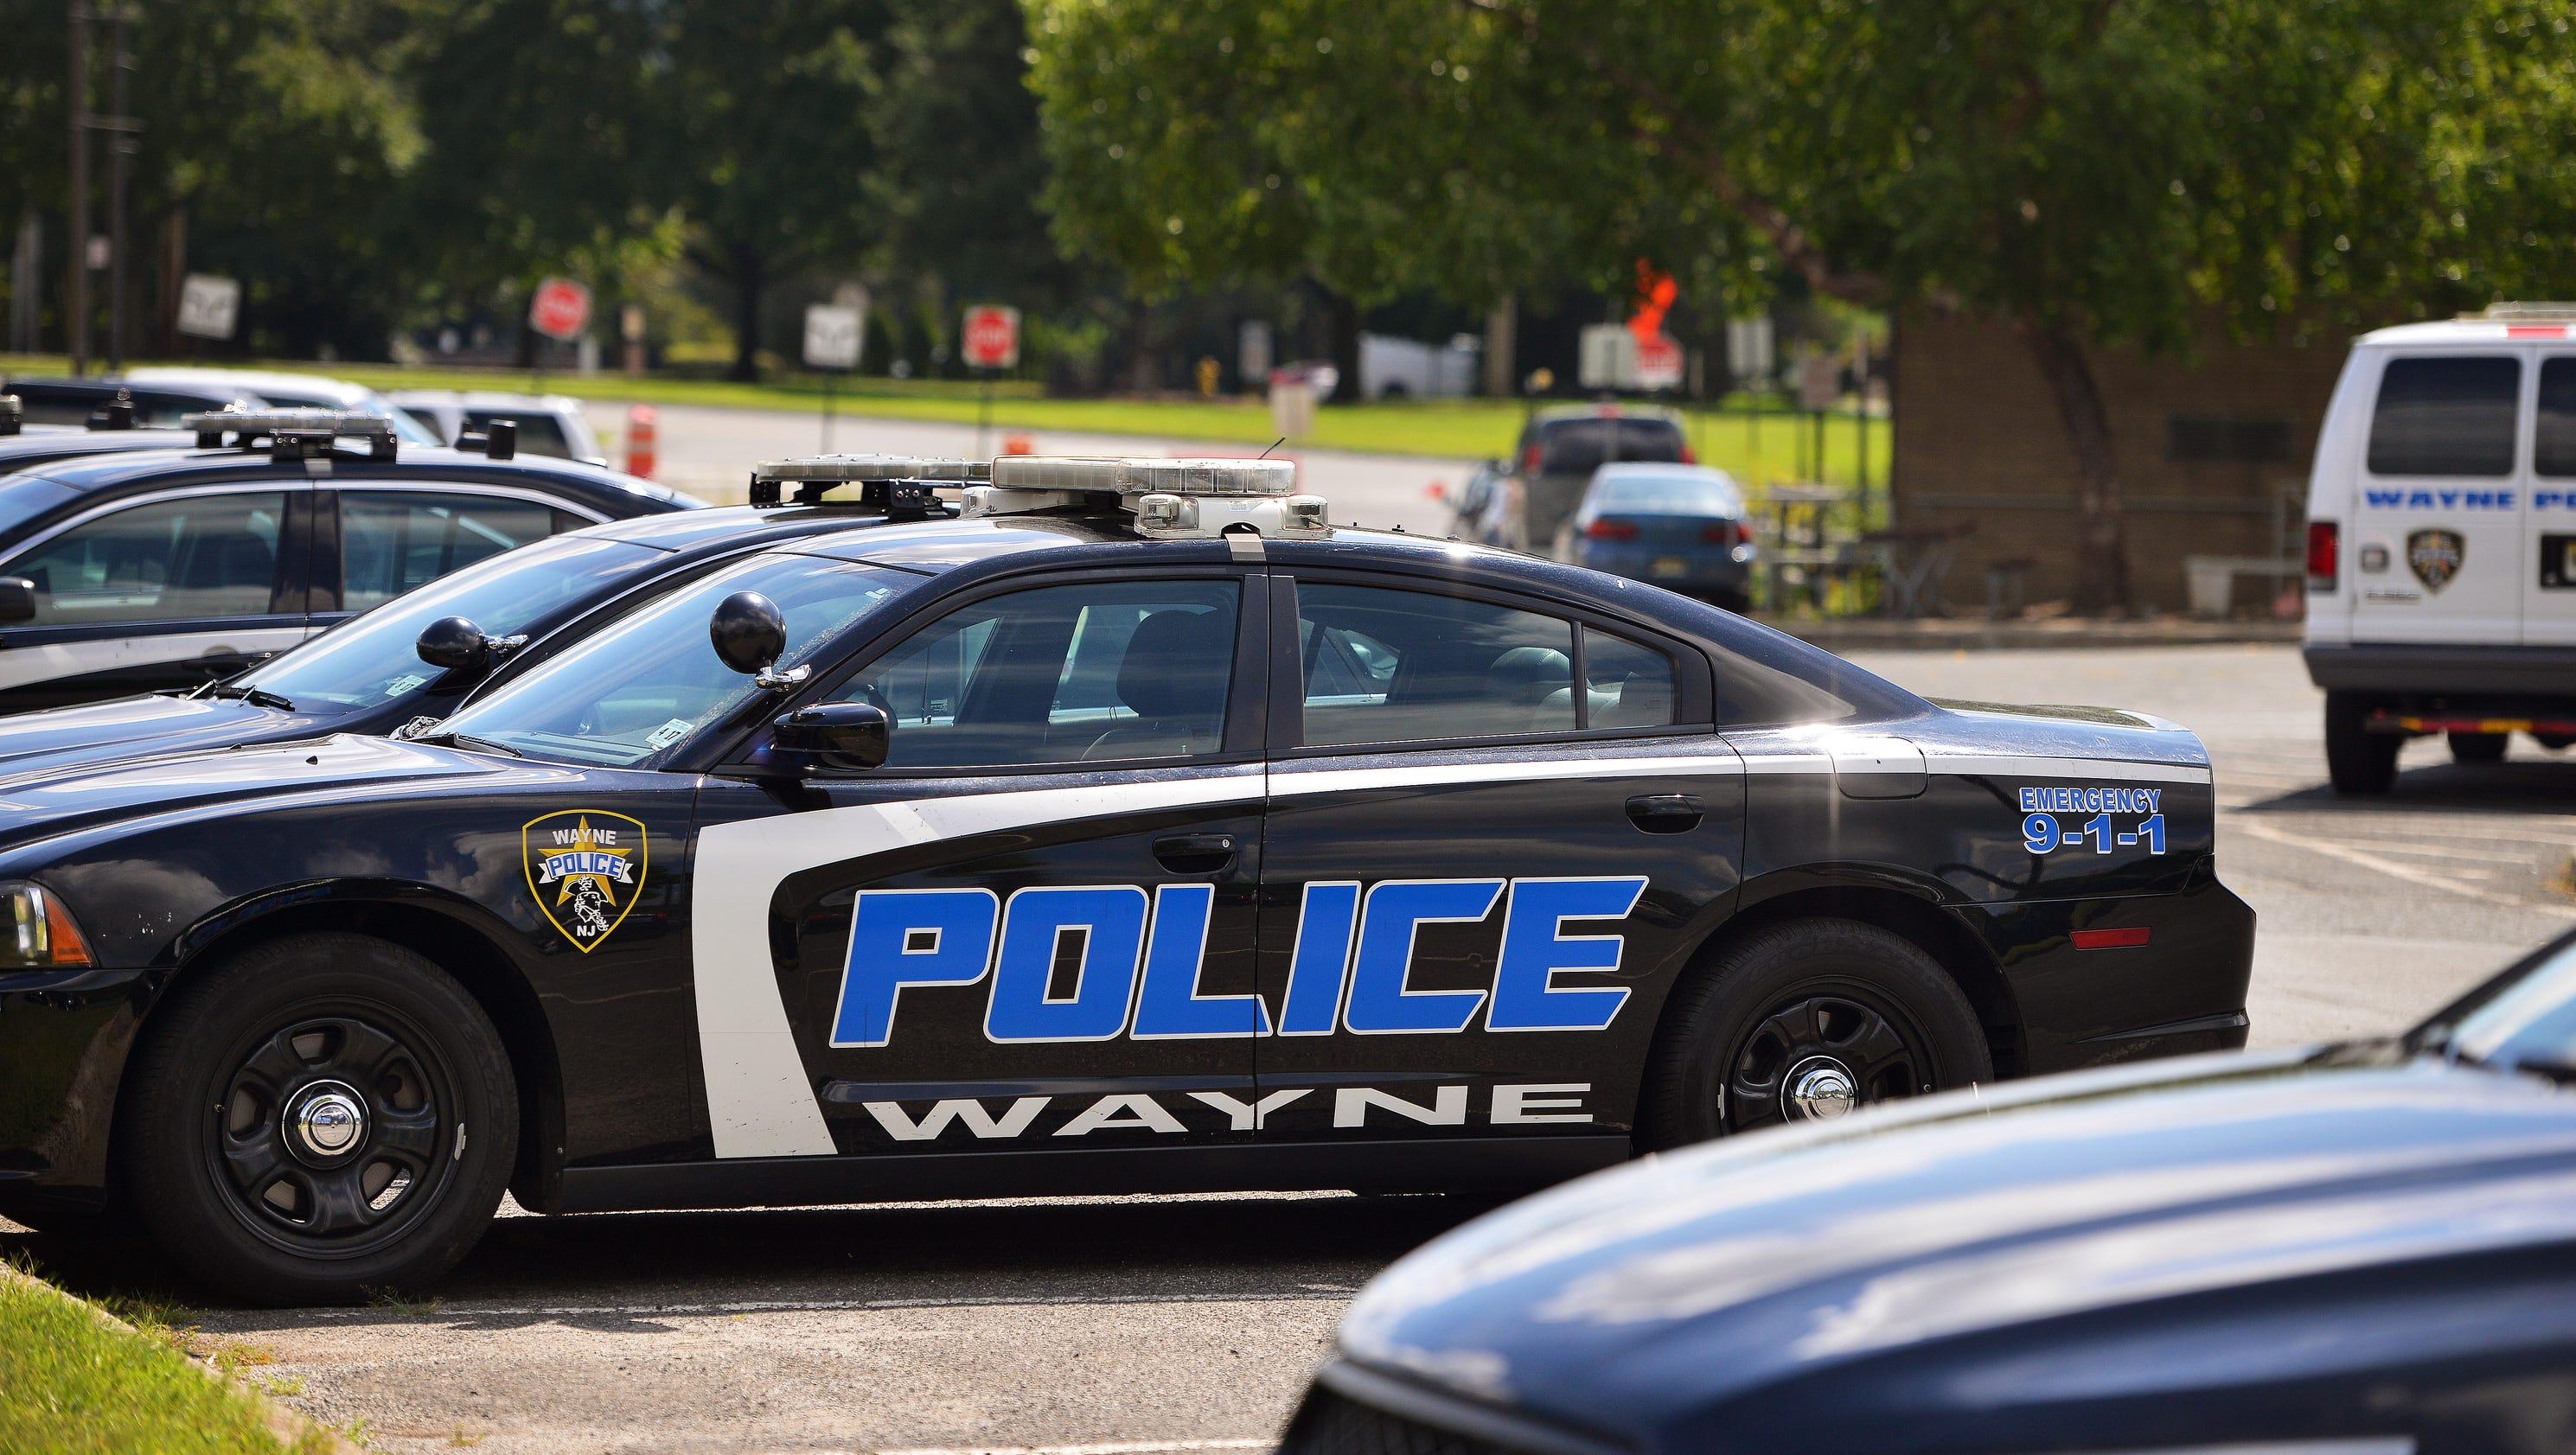 Wayne Motor Vehicles Vehicle Ideas